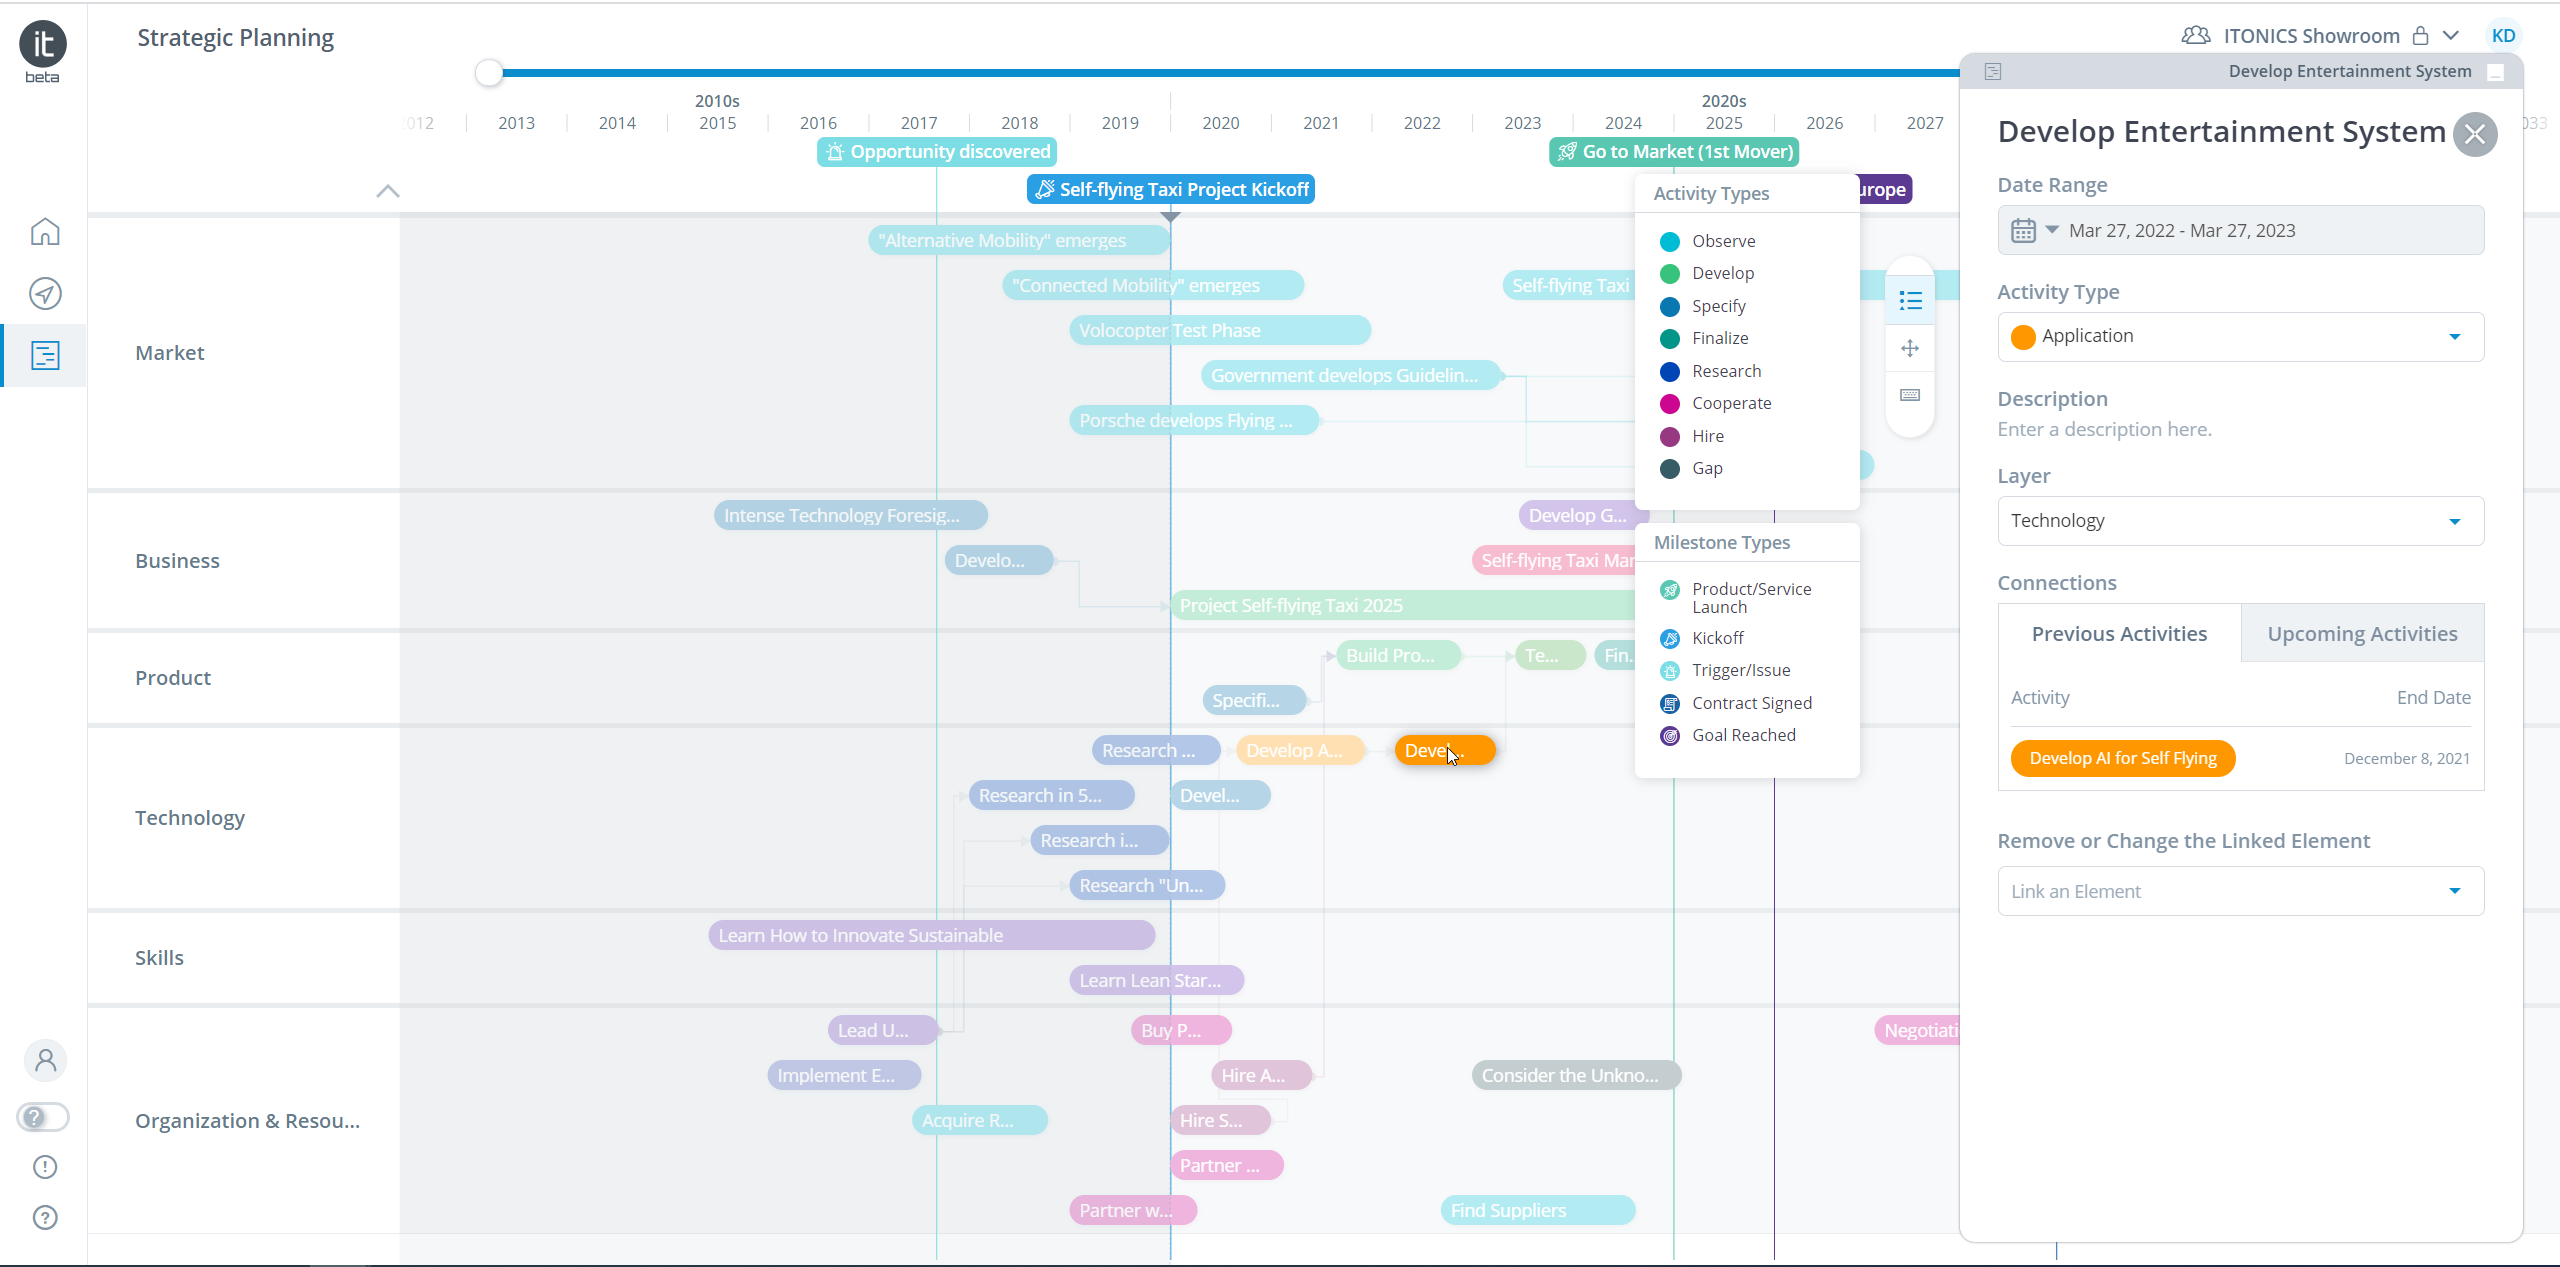 Individuelle Anpassung der  ITONICS Roadmap